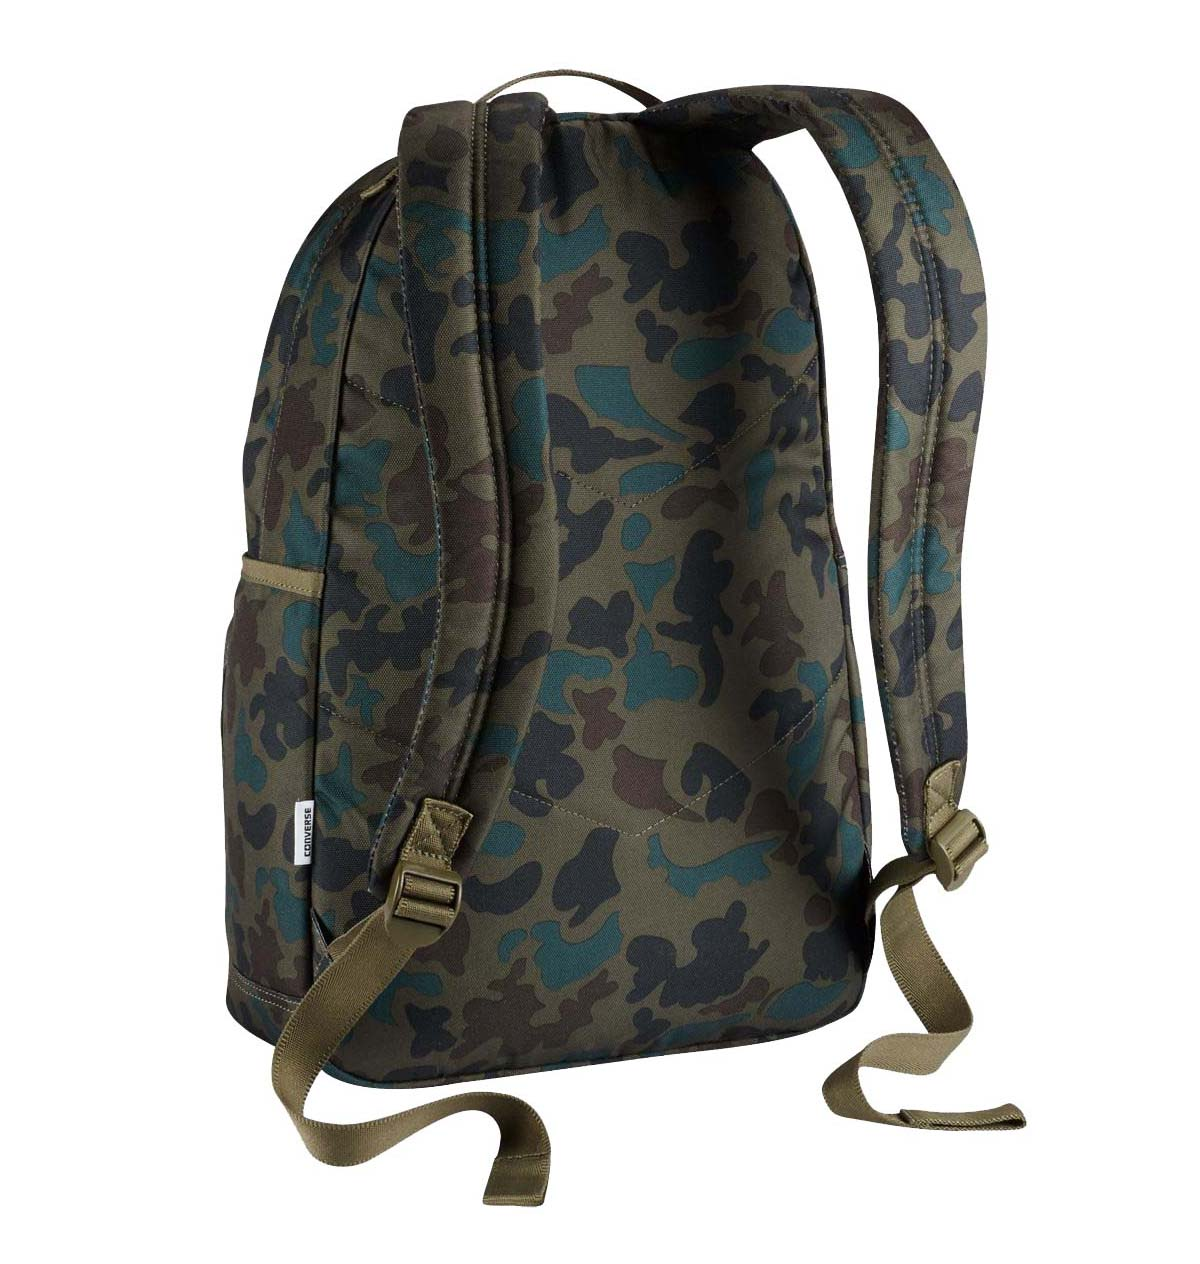 Converse Chuck Taylor All Star Go Backpack 2.0  a5d8774fe6fae